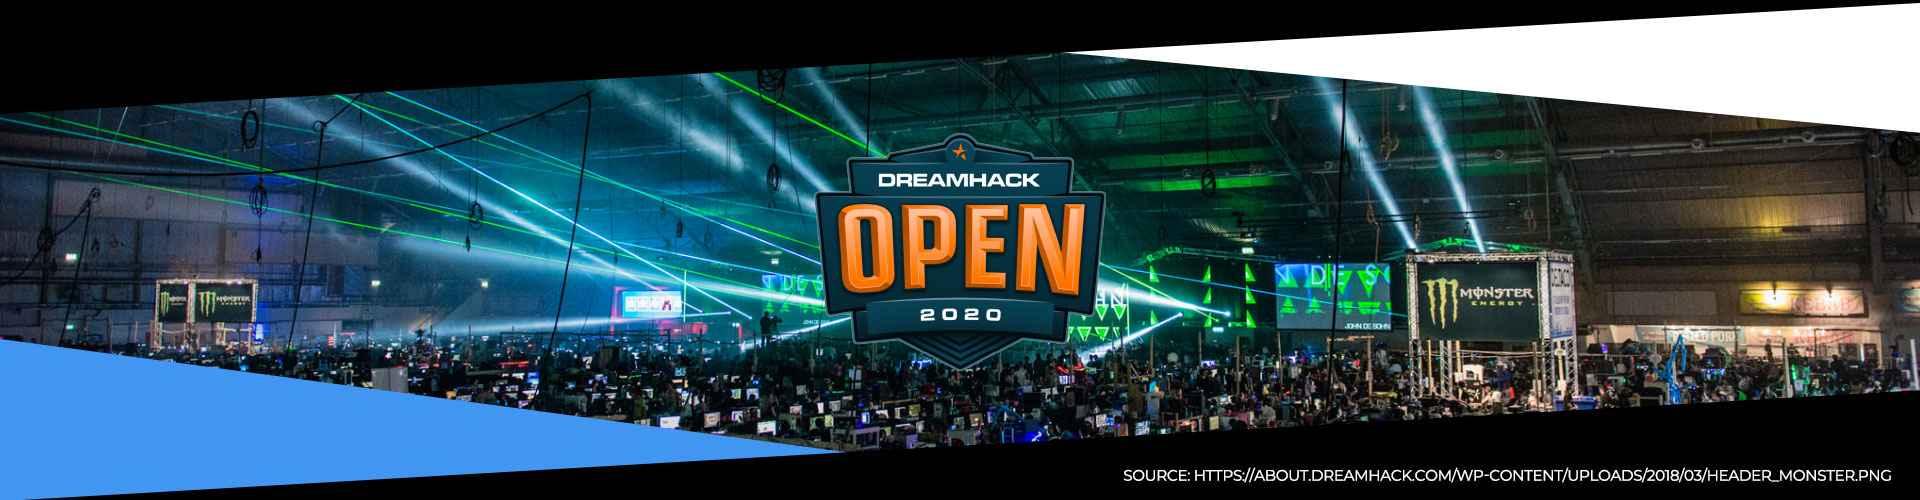 Eventsida för DreamHack Open Anaheim.